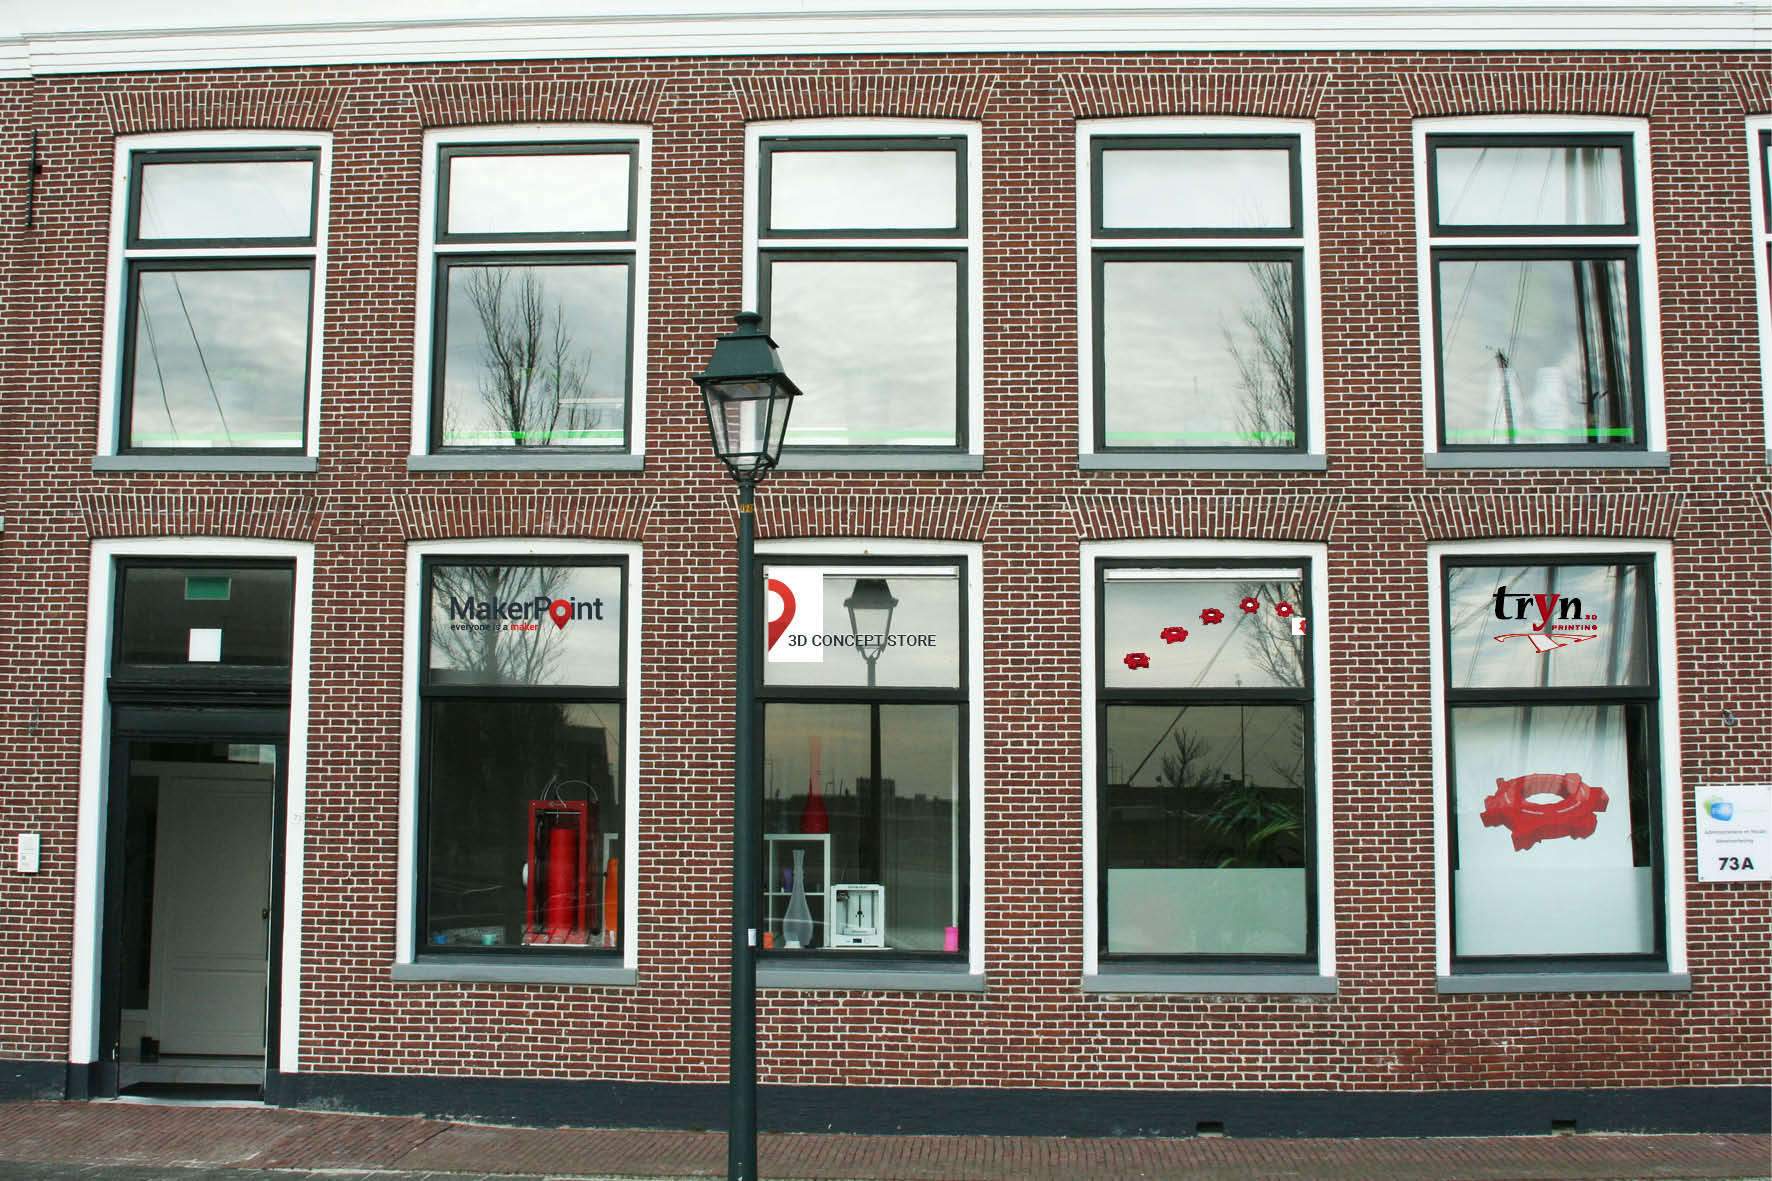 MakerPoint Harlingen